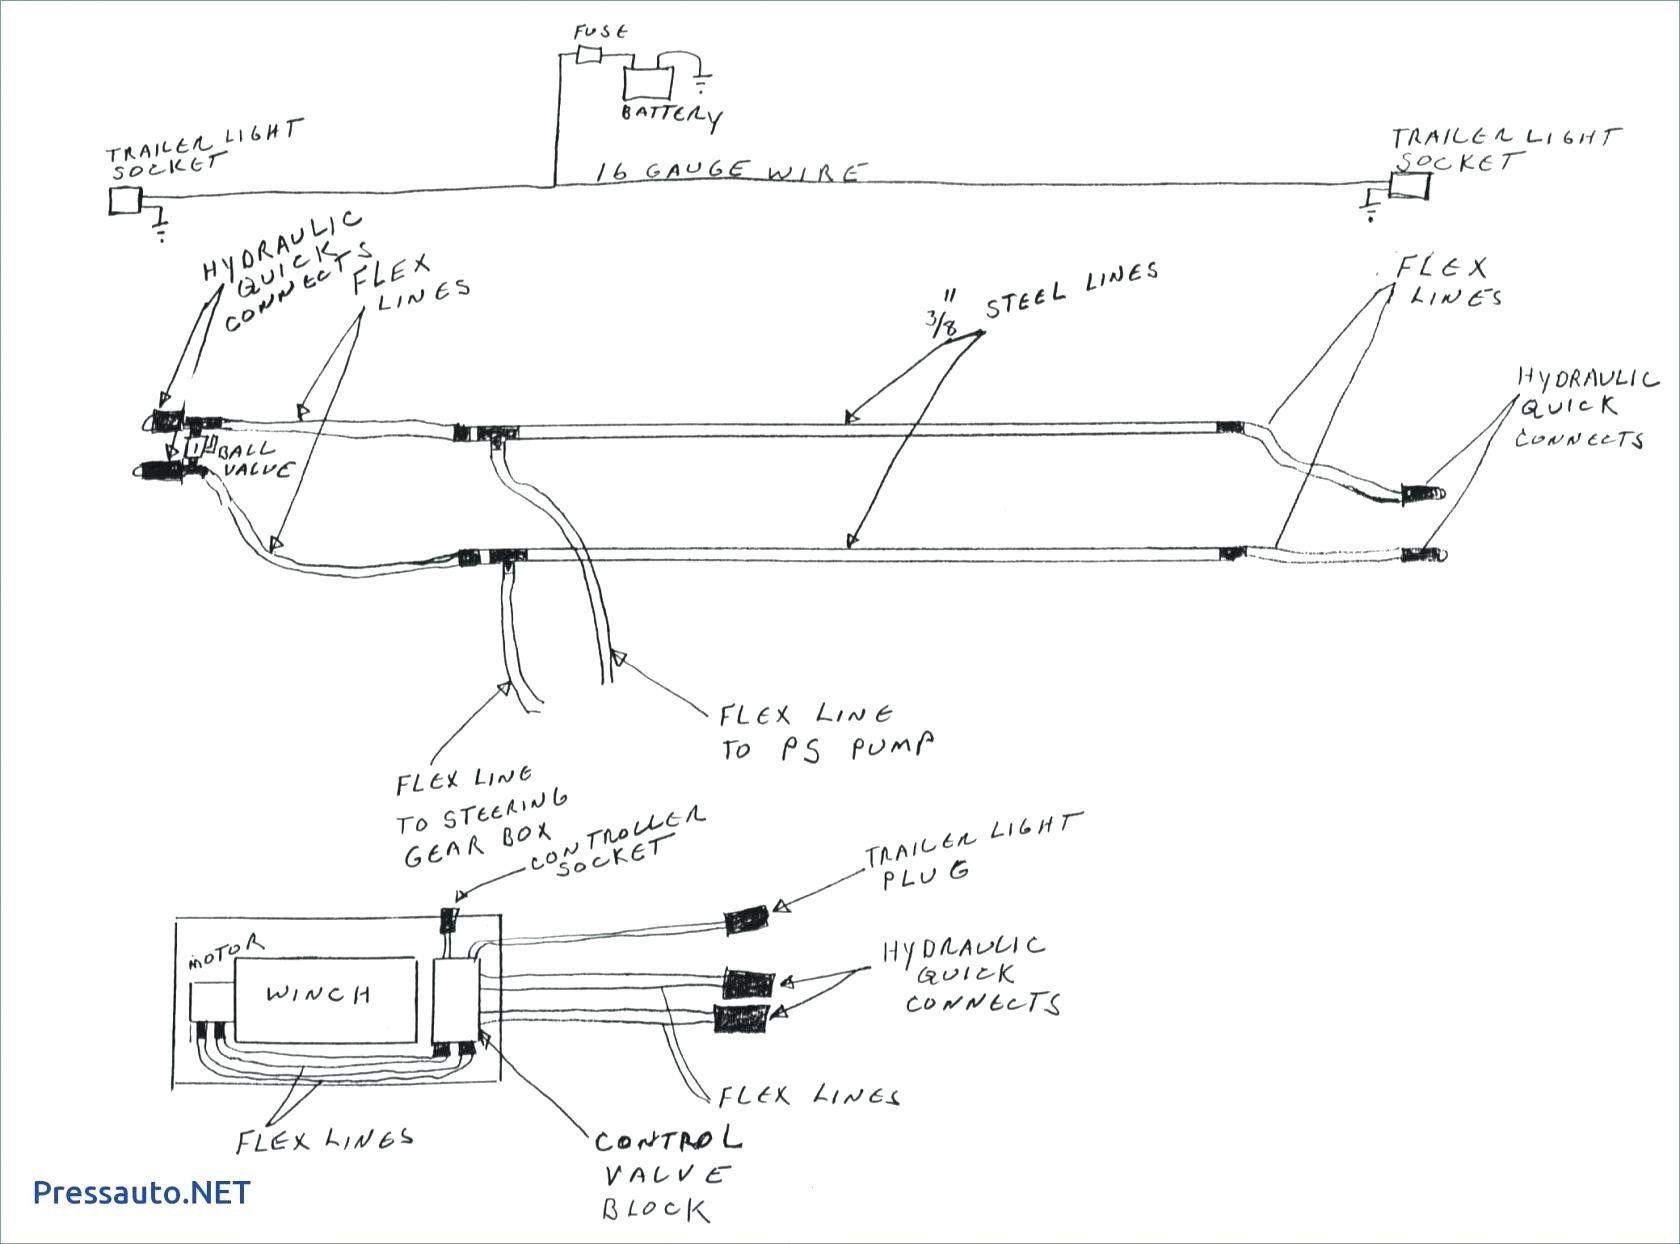 Winch Contactor Wiring Wiring Diagram Add In 2020 Diagram Electrical Diagram